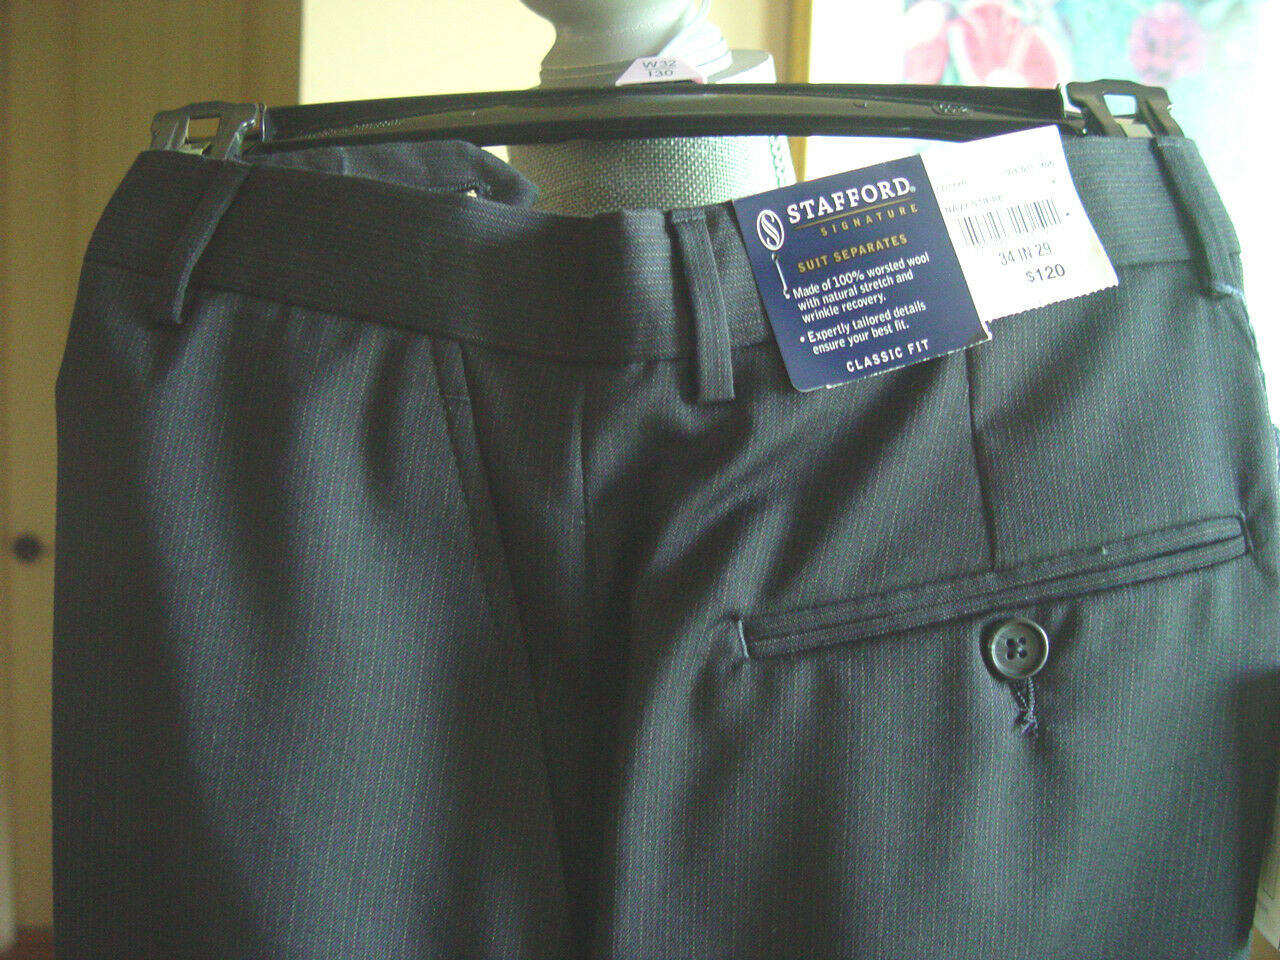 Stafford New Dress Pant Size 34x29 bluee Dress - Flat Front  Wool Blend